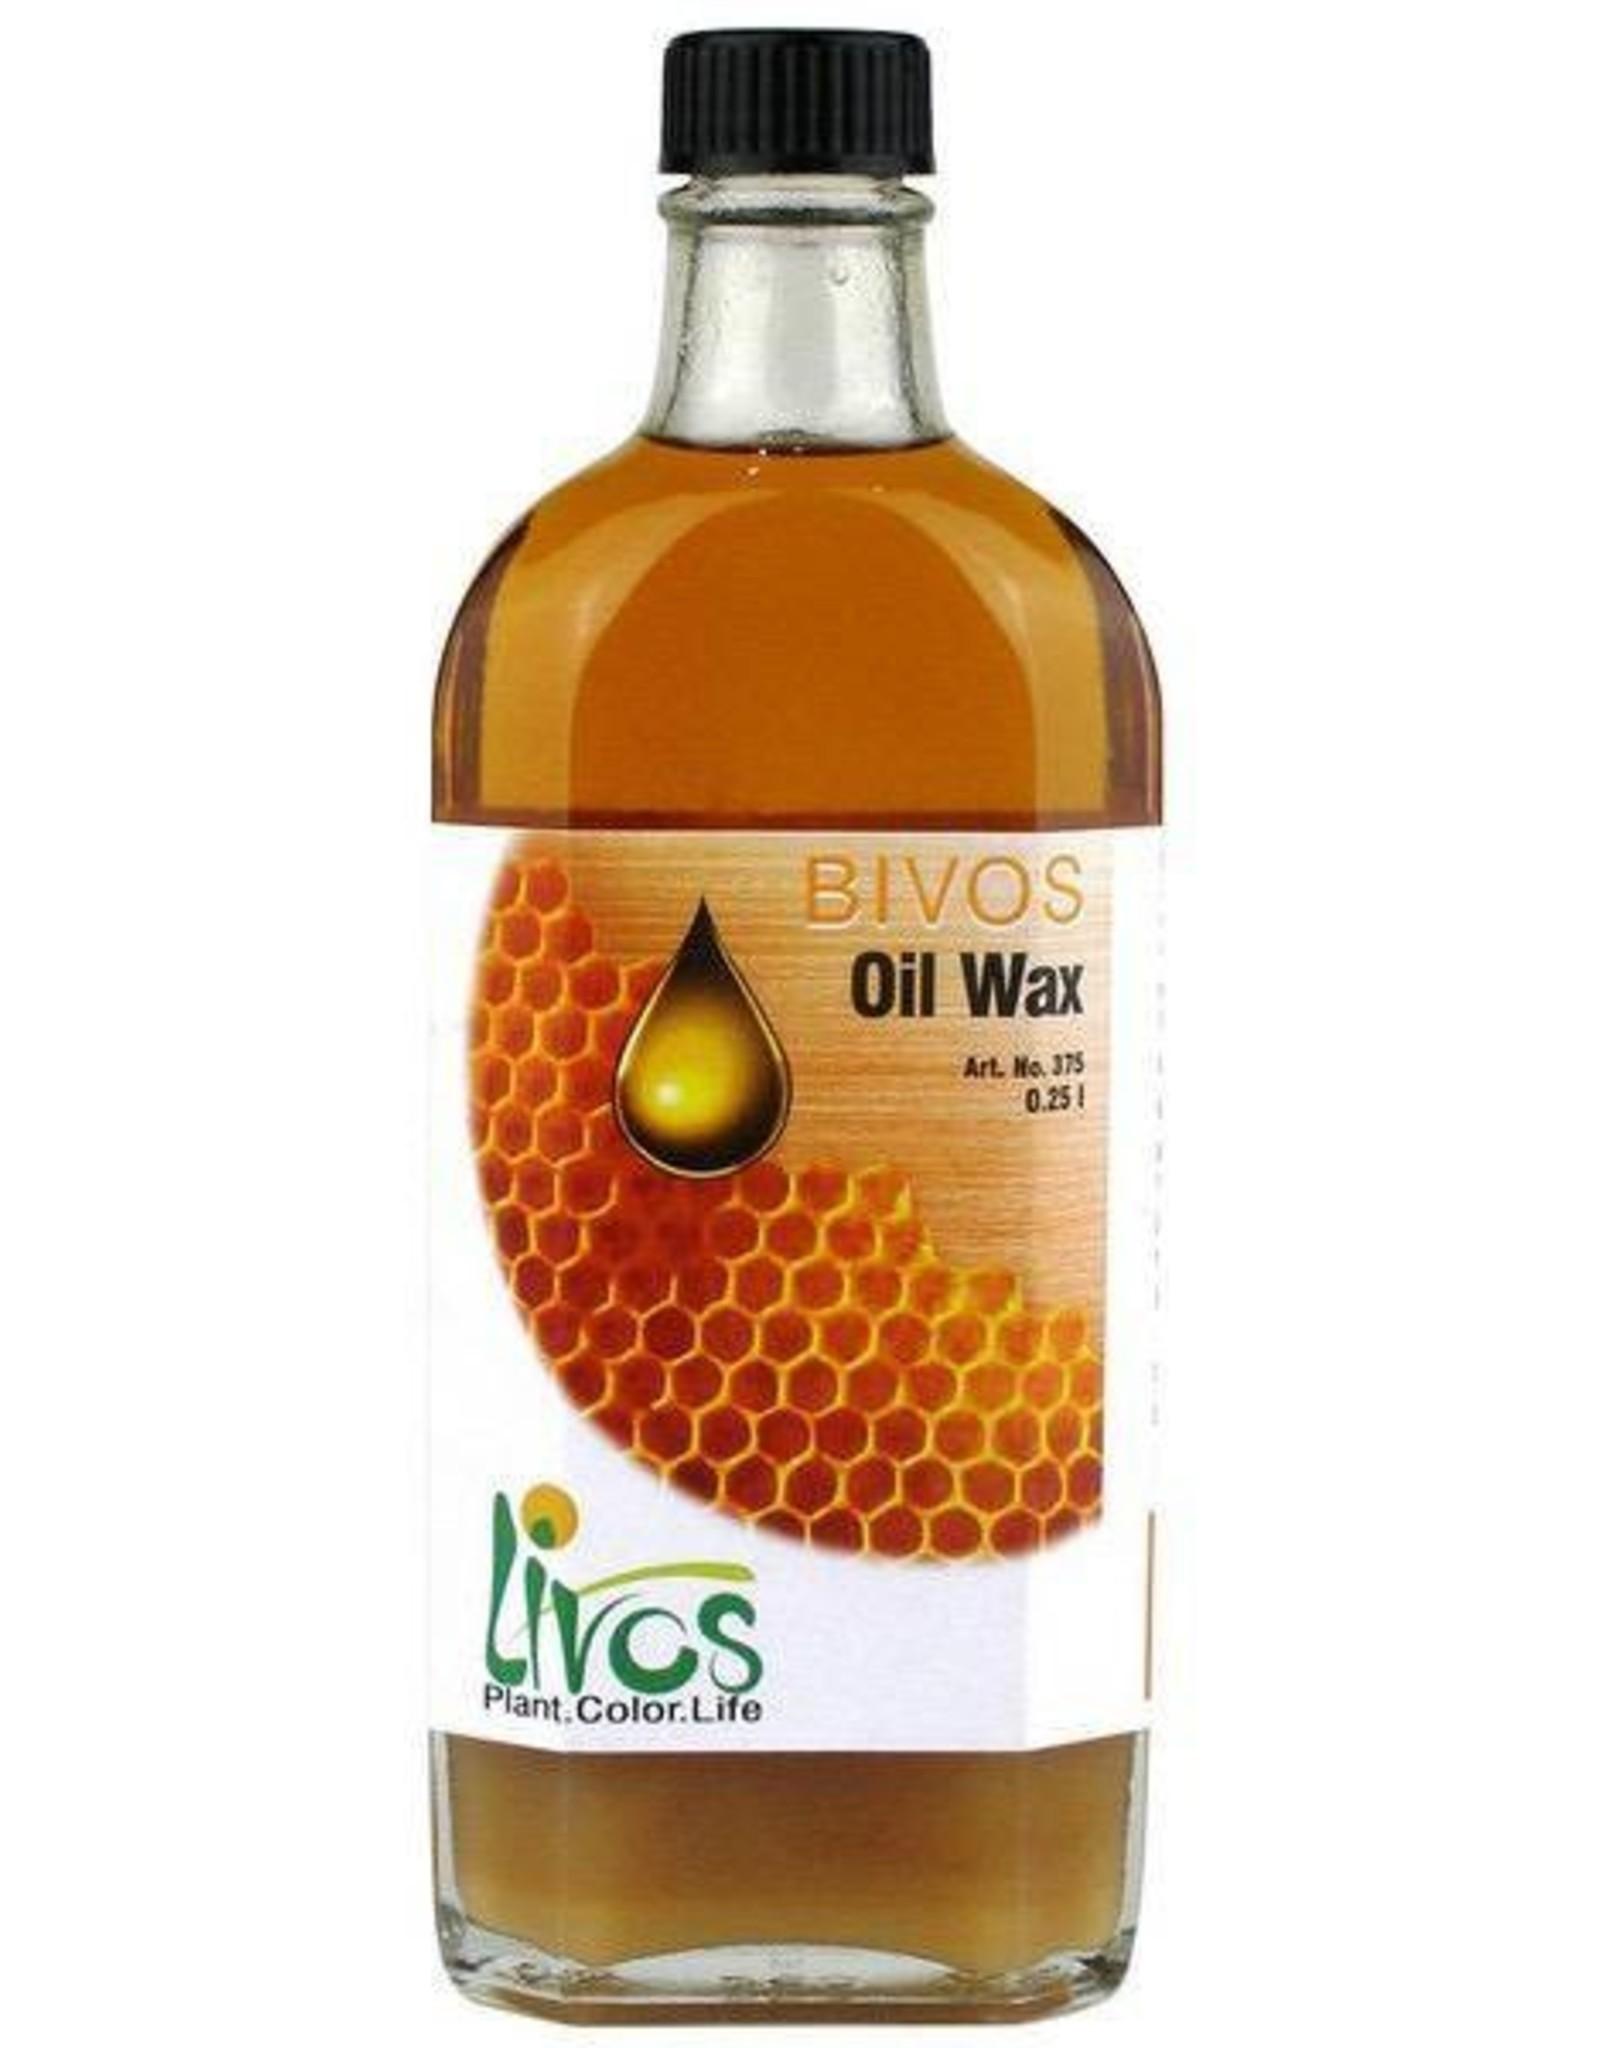 LIVOS Bivos Oil Wax